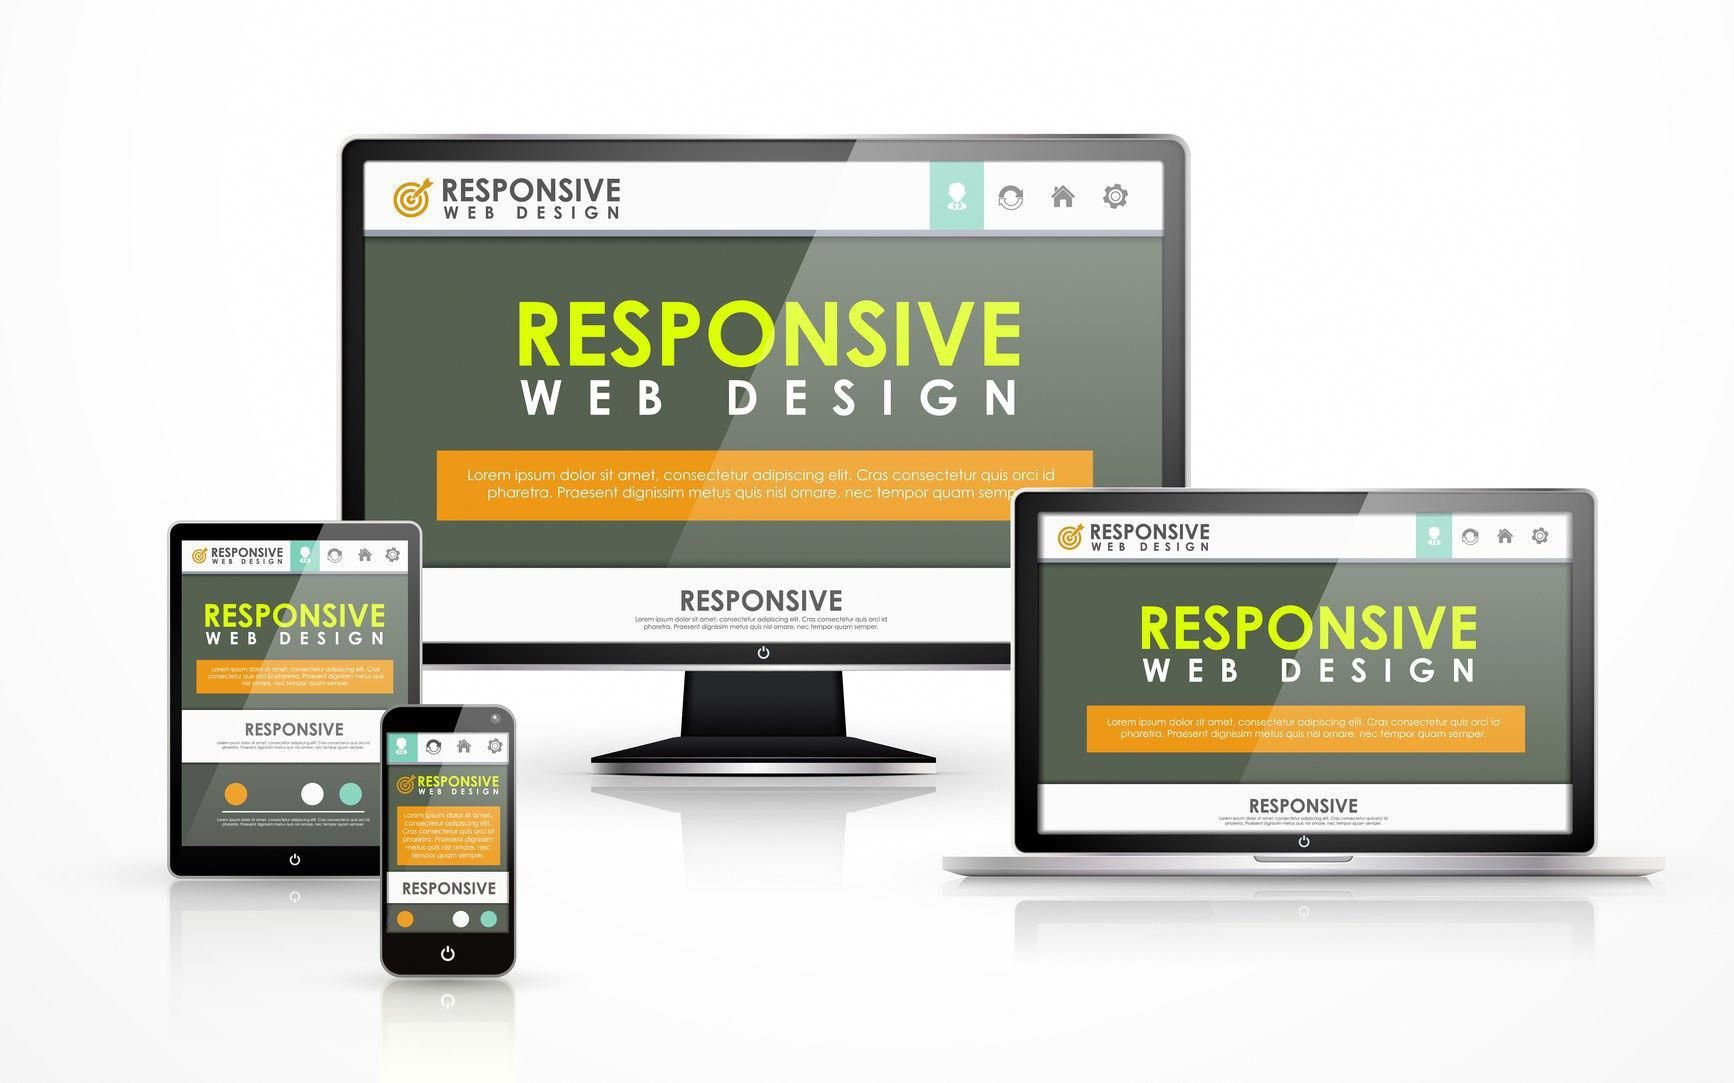 Web Design And Development Company New Jersey Responsive Design By Halpin Digital Website Design Company Web Design Web Design Agency